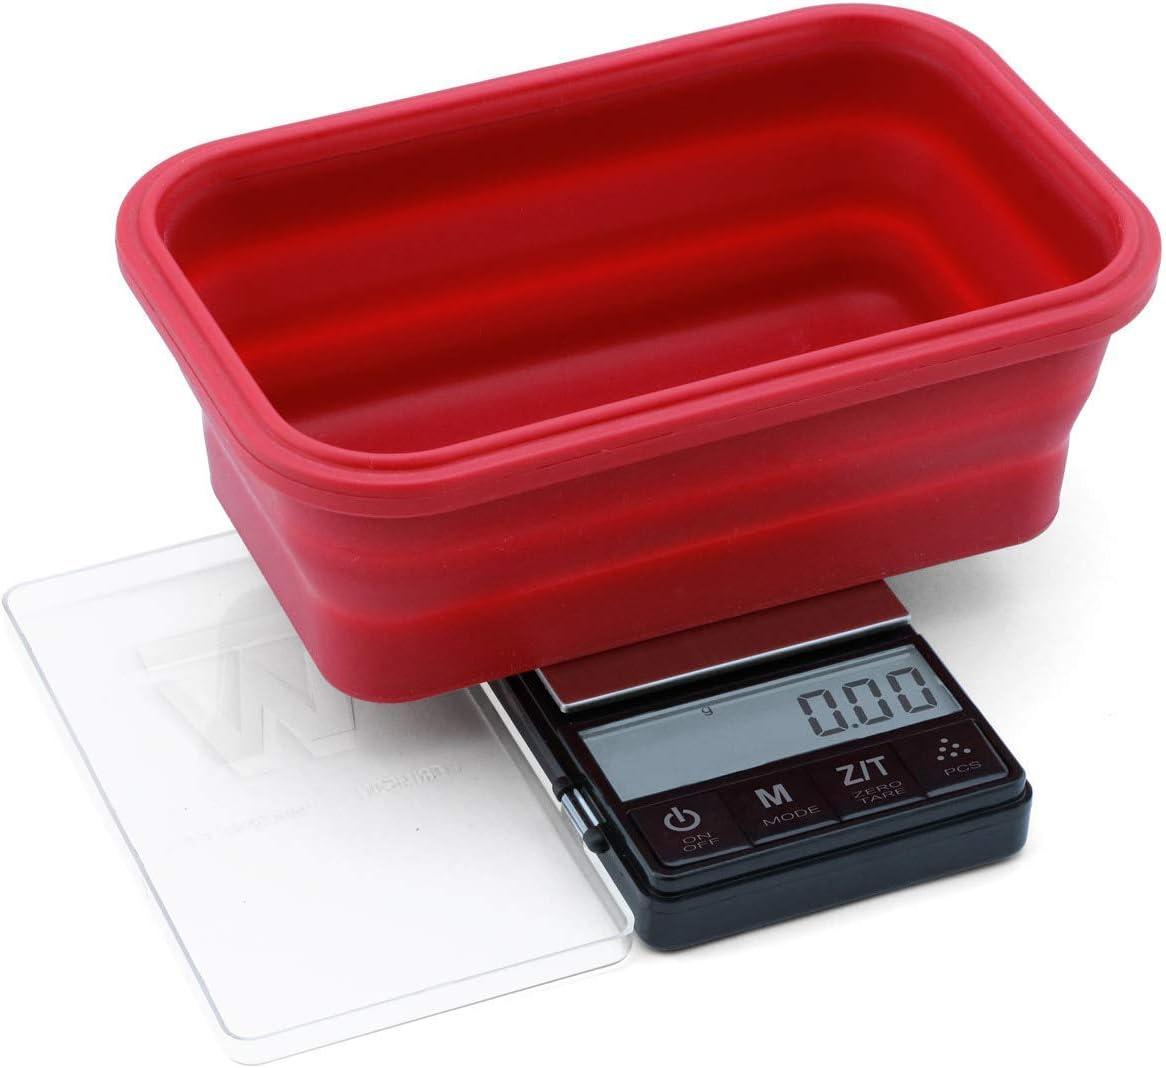 Boston Mall Truweigh Crimson Digital Mini Translated Scale 200g 0.01g x Black Digit -